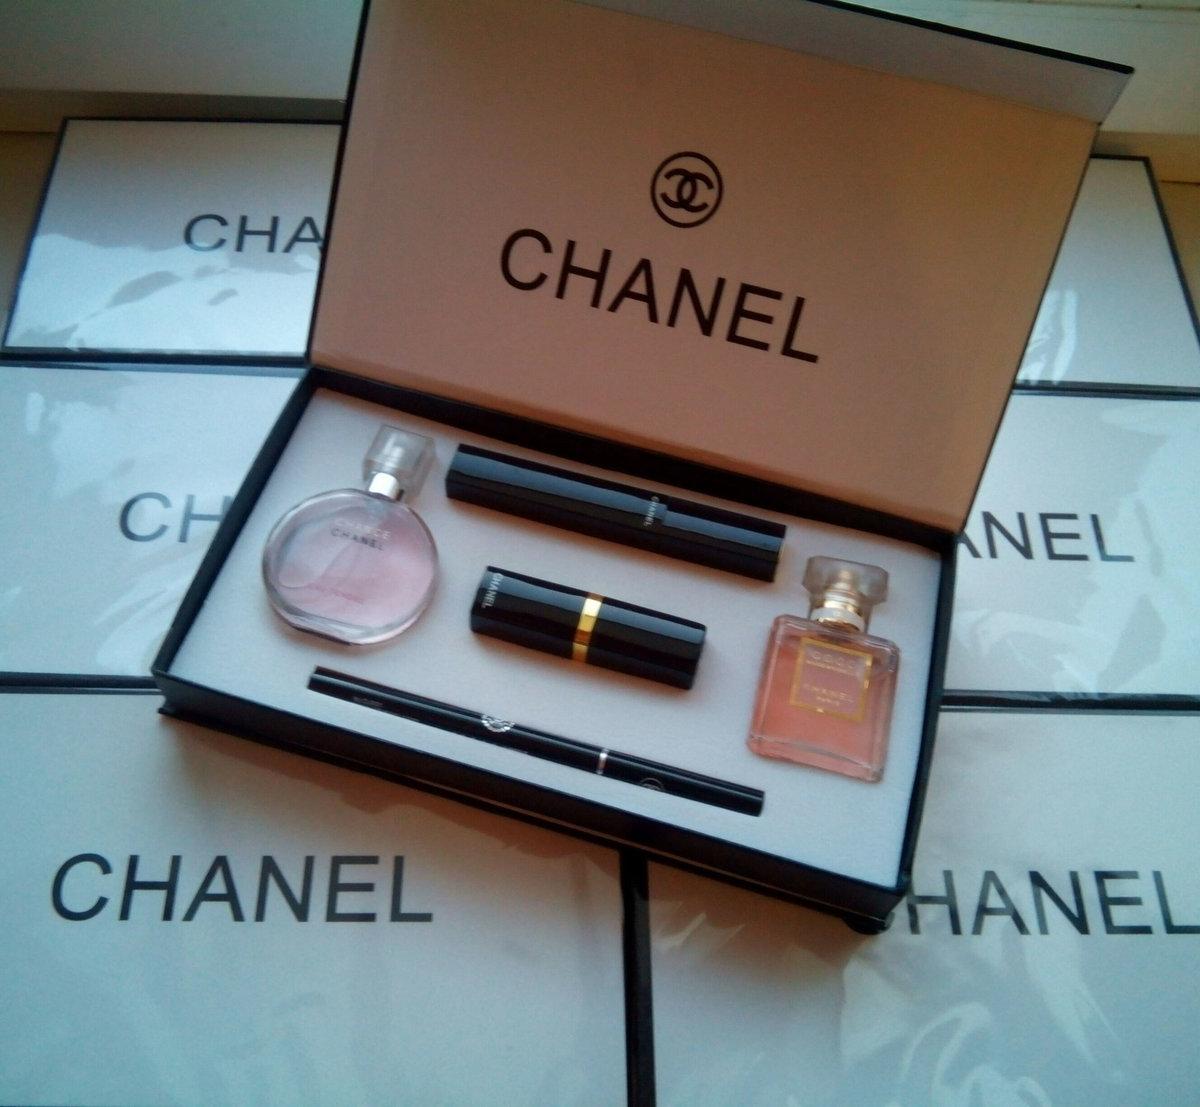 a0ceccbbee3f Набор 5 в 1 от Chanel. Набор chanel 5 in 1 оптом Официальный сайт ...